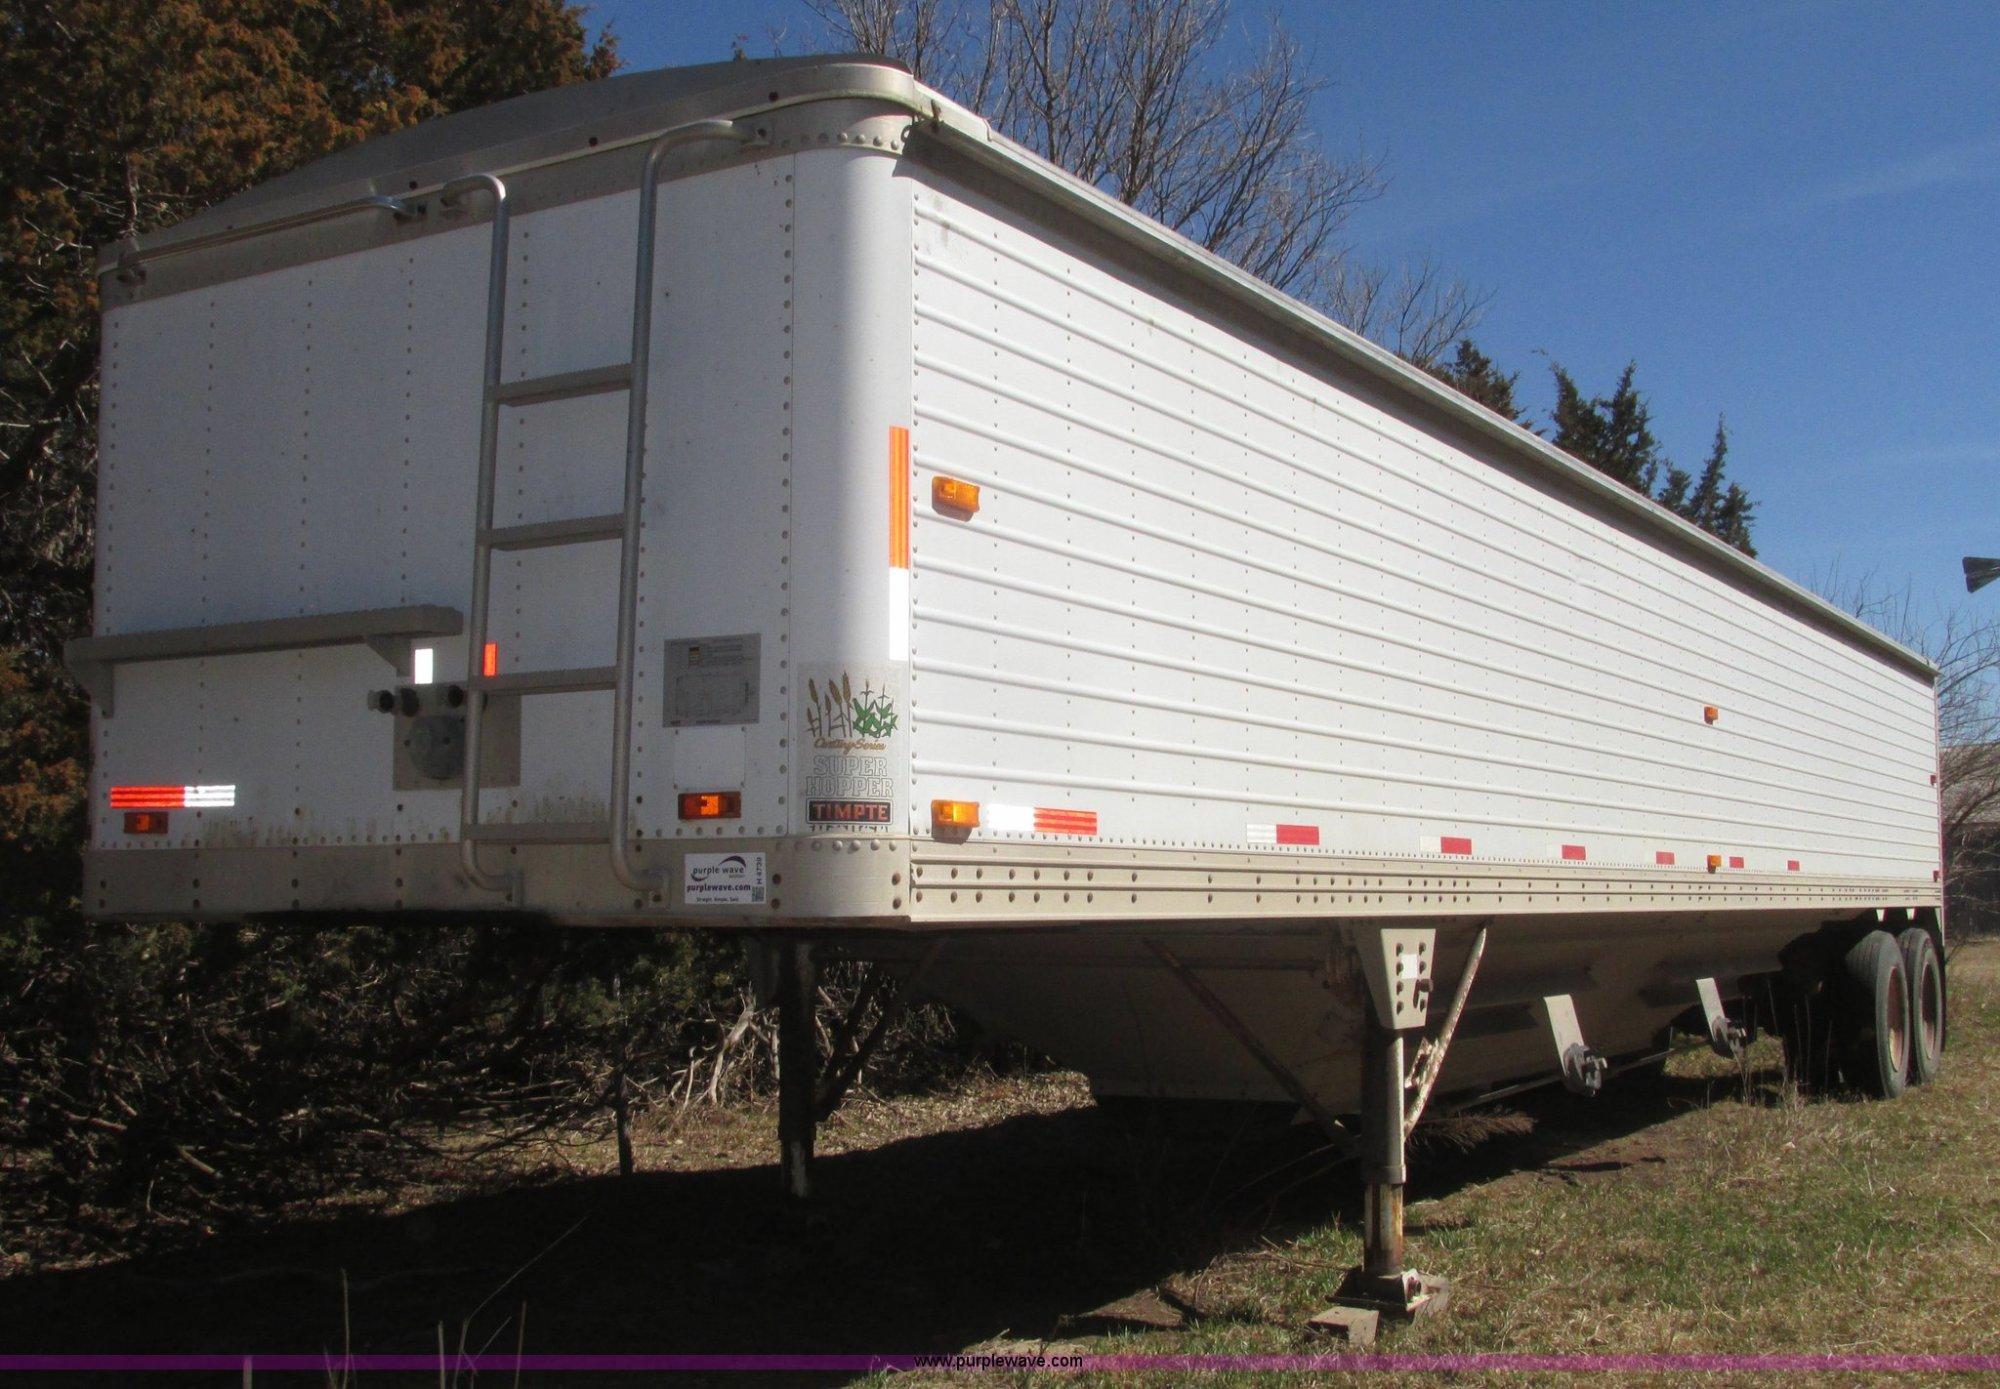 hight resolution of 1988 timpte super hopper century series grain trailer itemfull size in new window st purple wave auction autolock electric tarp installation